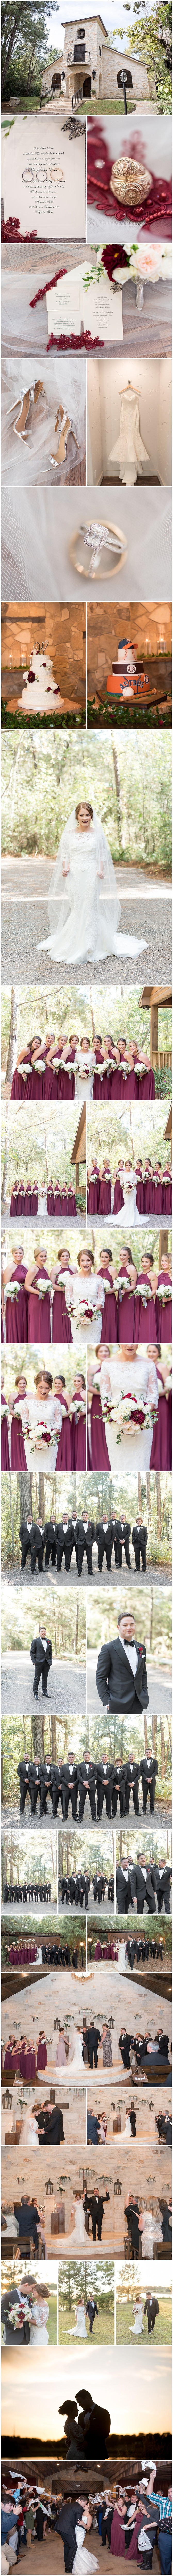 Magnolia Bells Wedding | Magnolia, TX | Katelyn Todd Photography